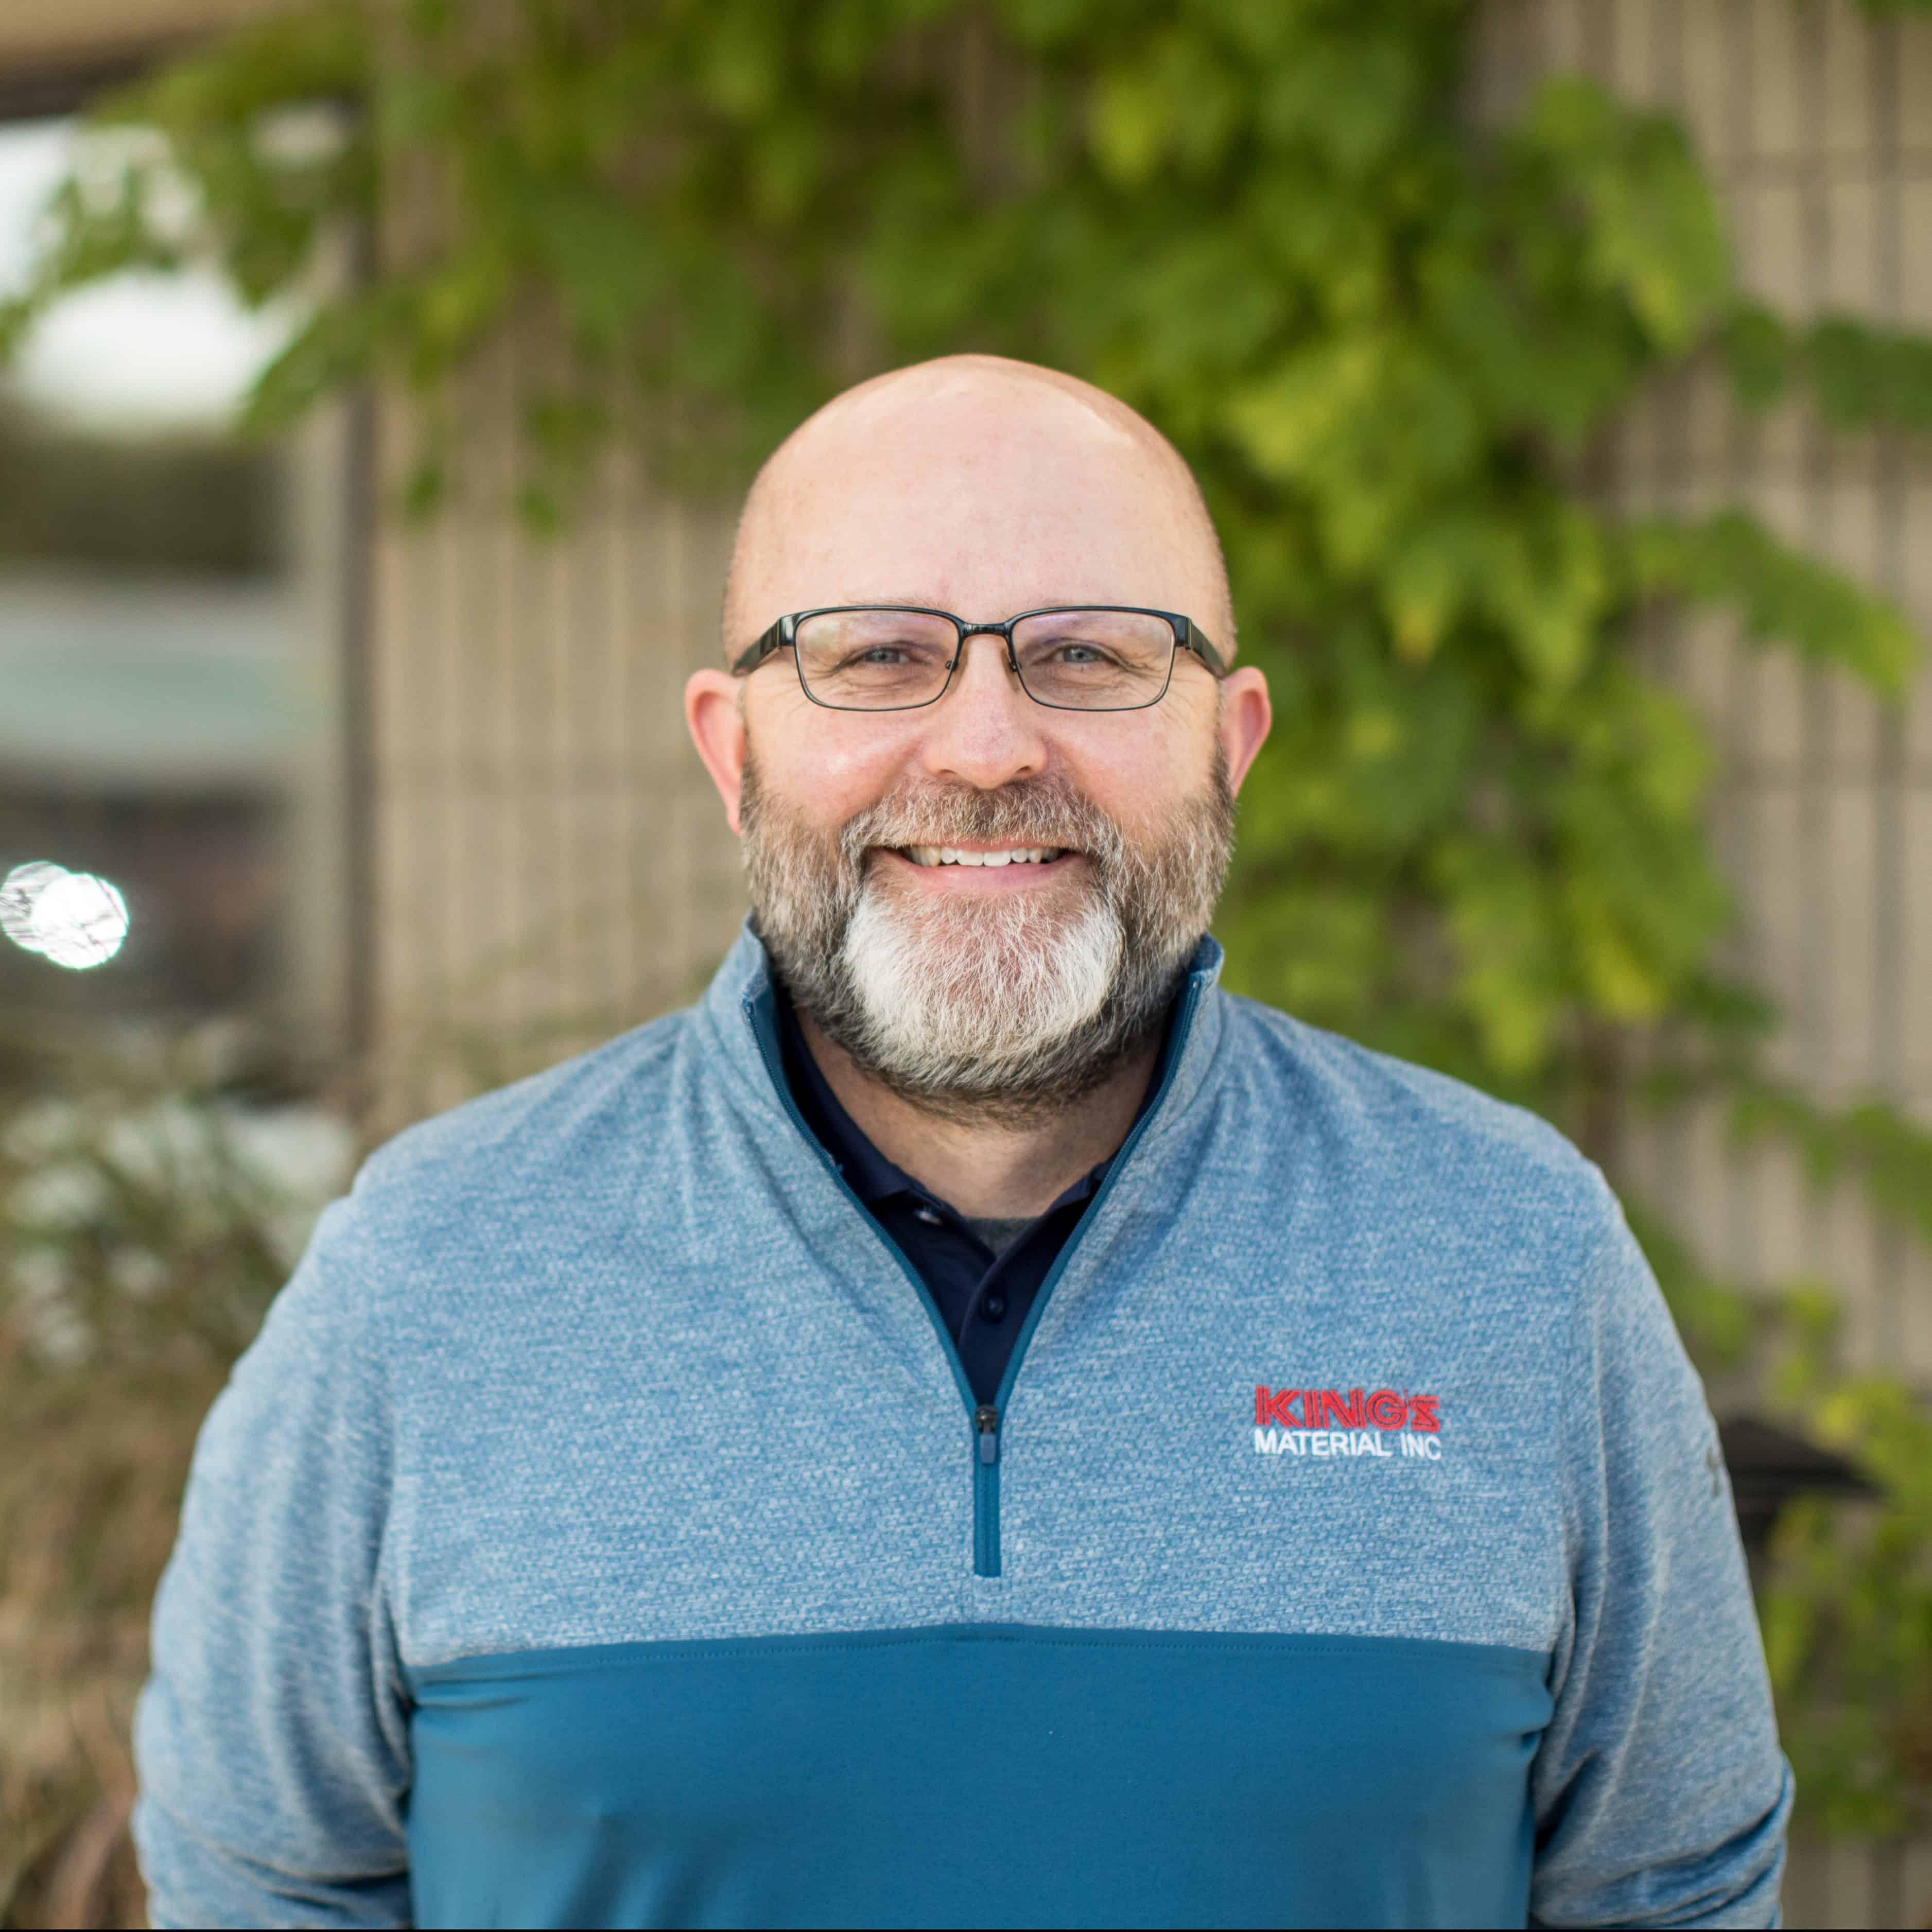 Tim Martin Coralville Manager